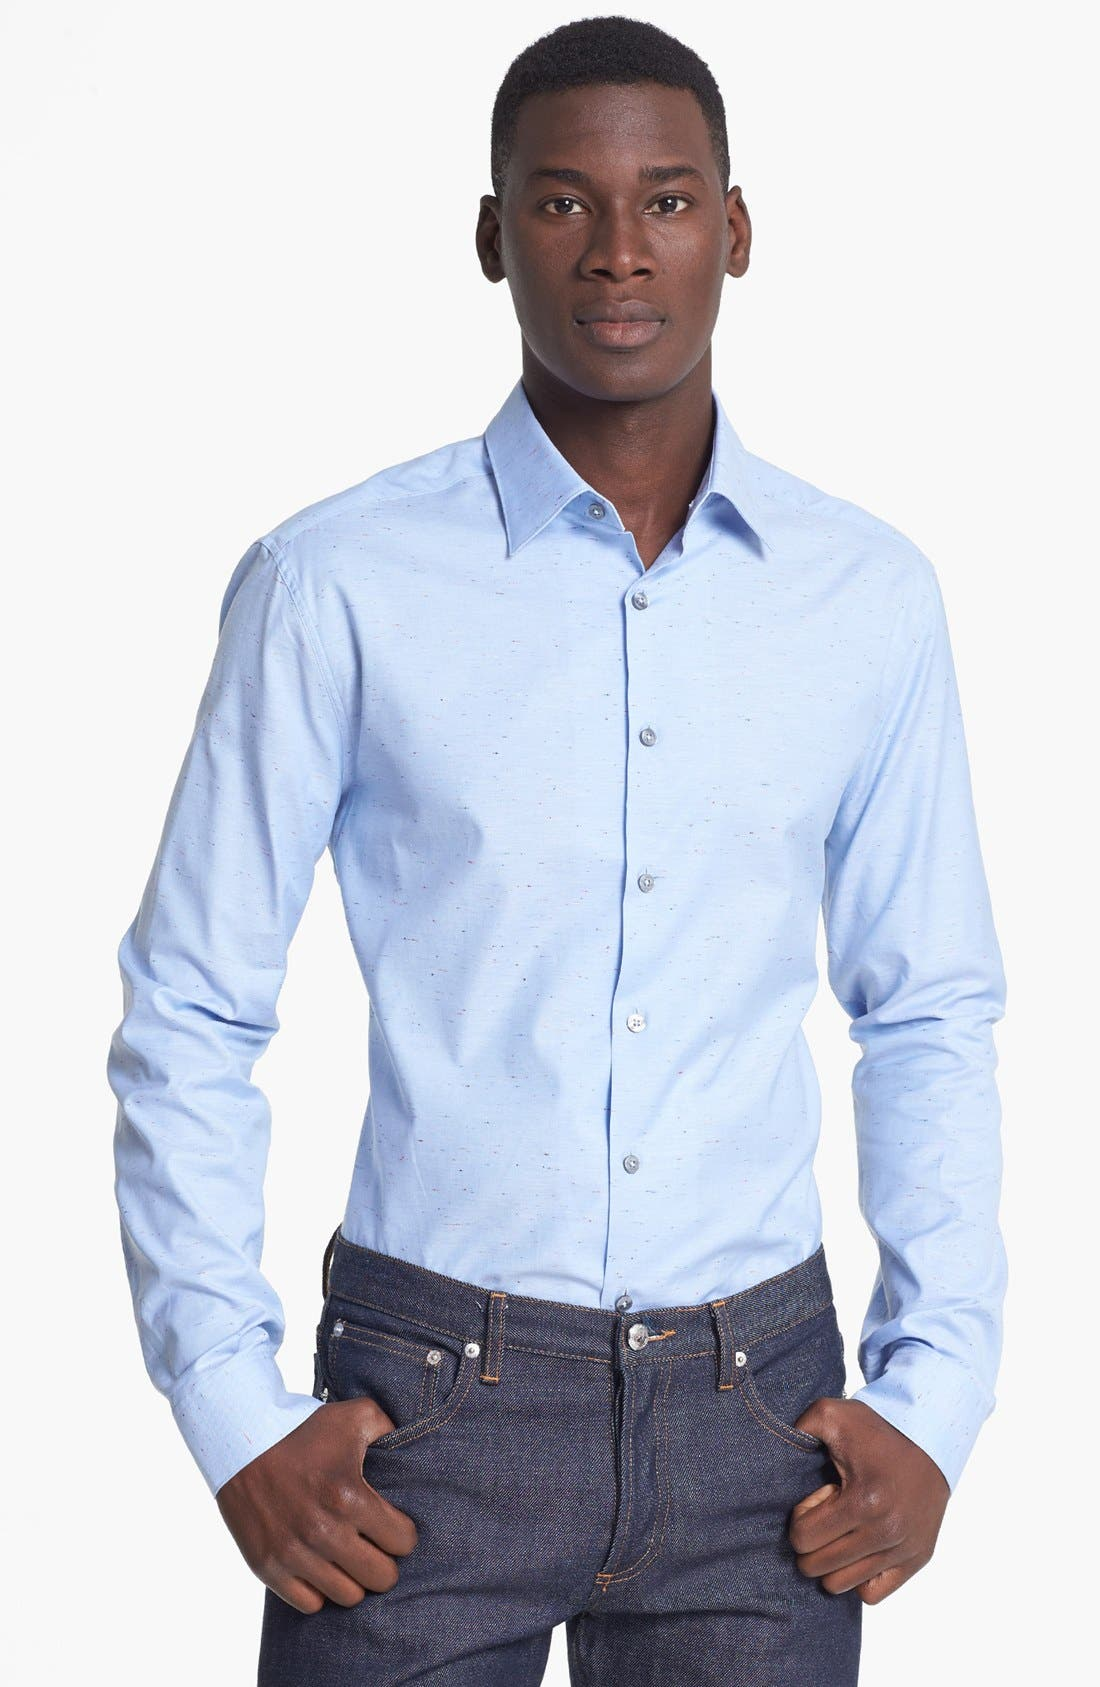 Alternate Image 1 Selected - Paul Smith London Slim Fit Nep Oxford Dress Shirt